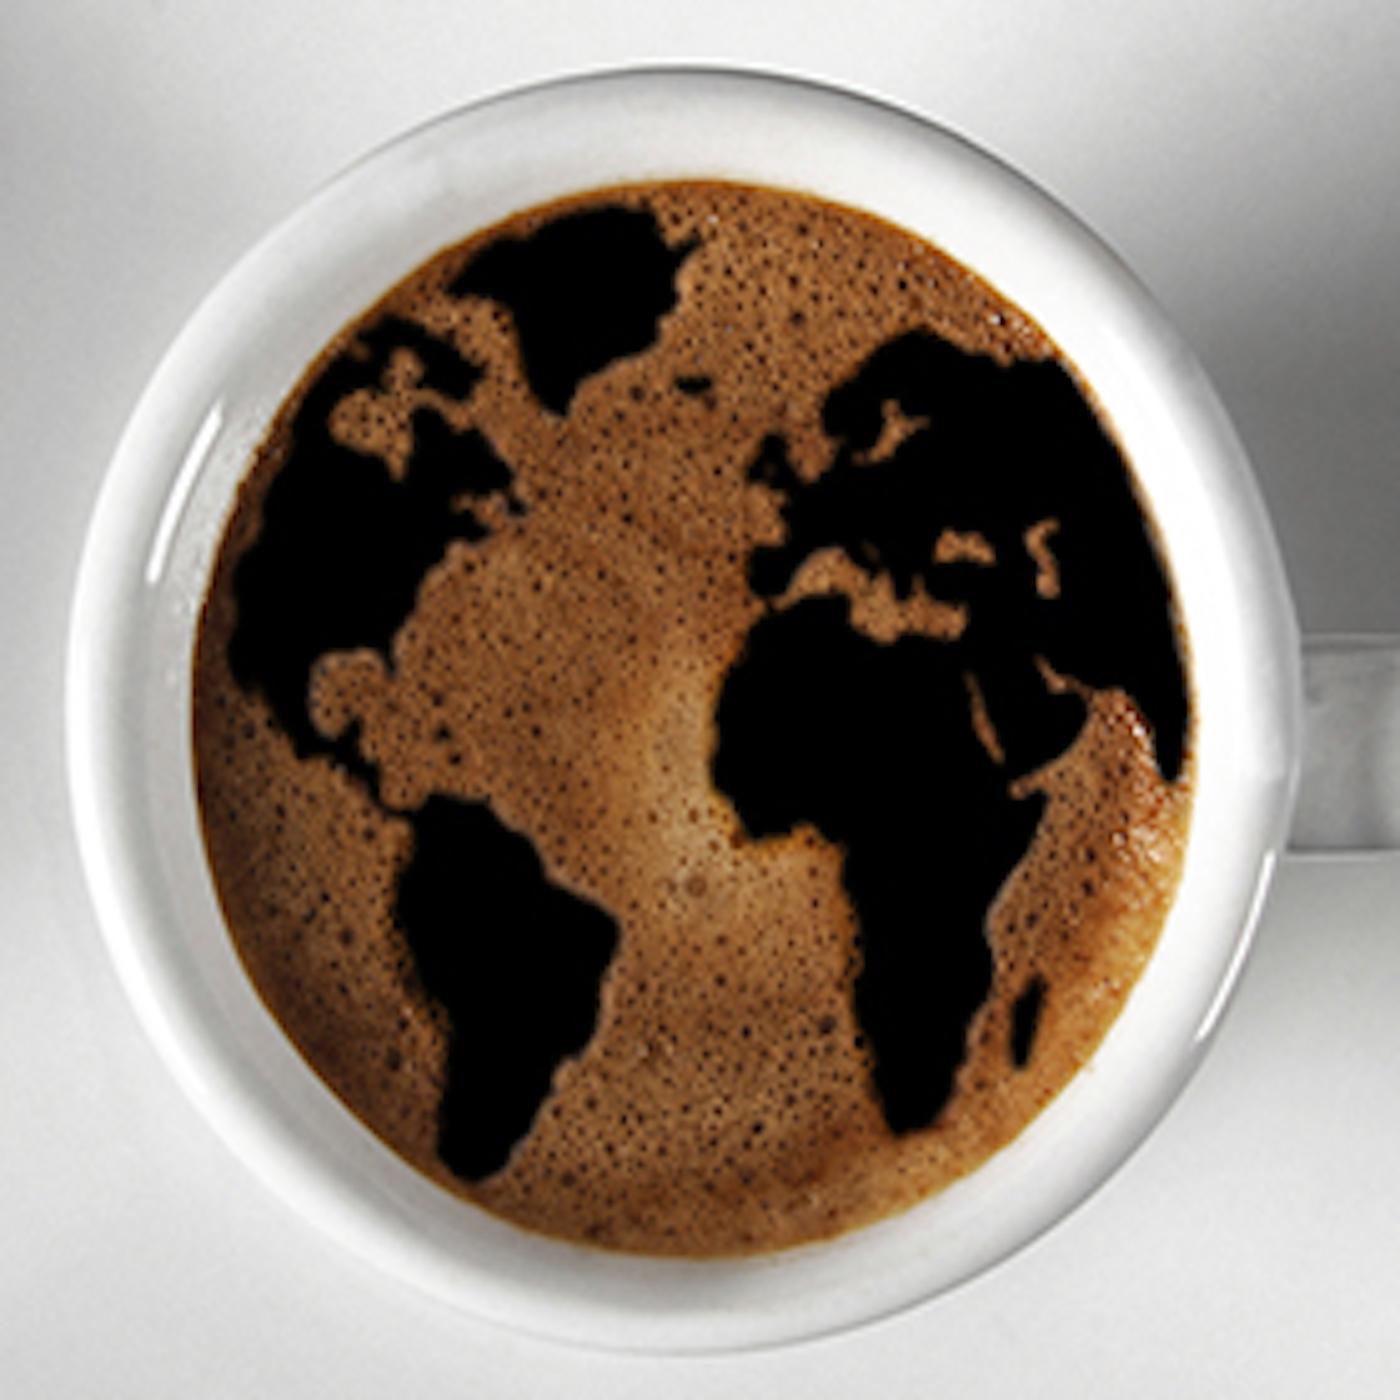 International Coffee (remix)